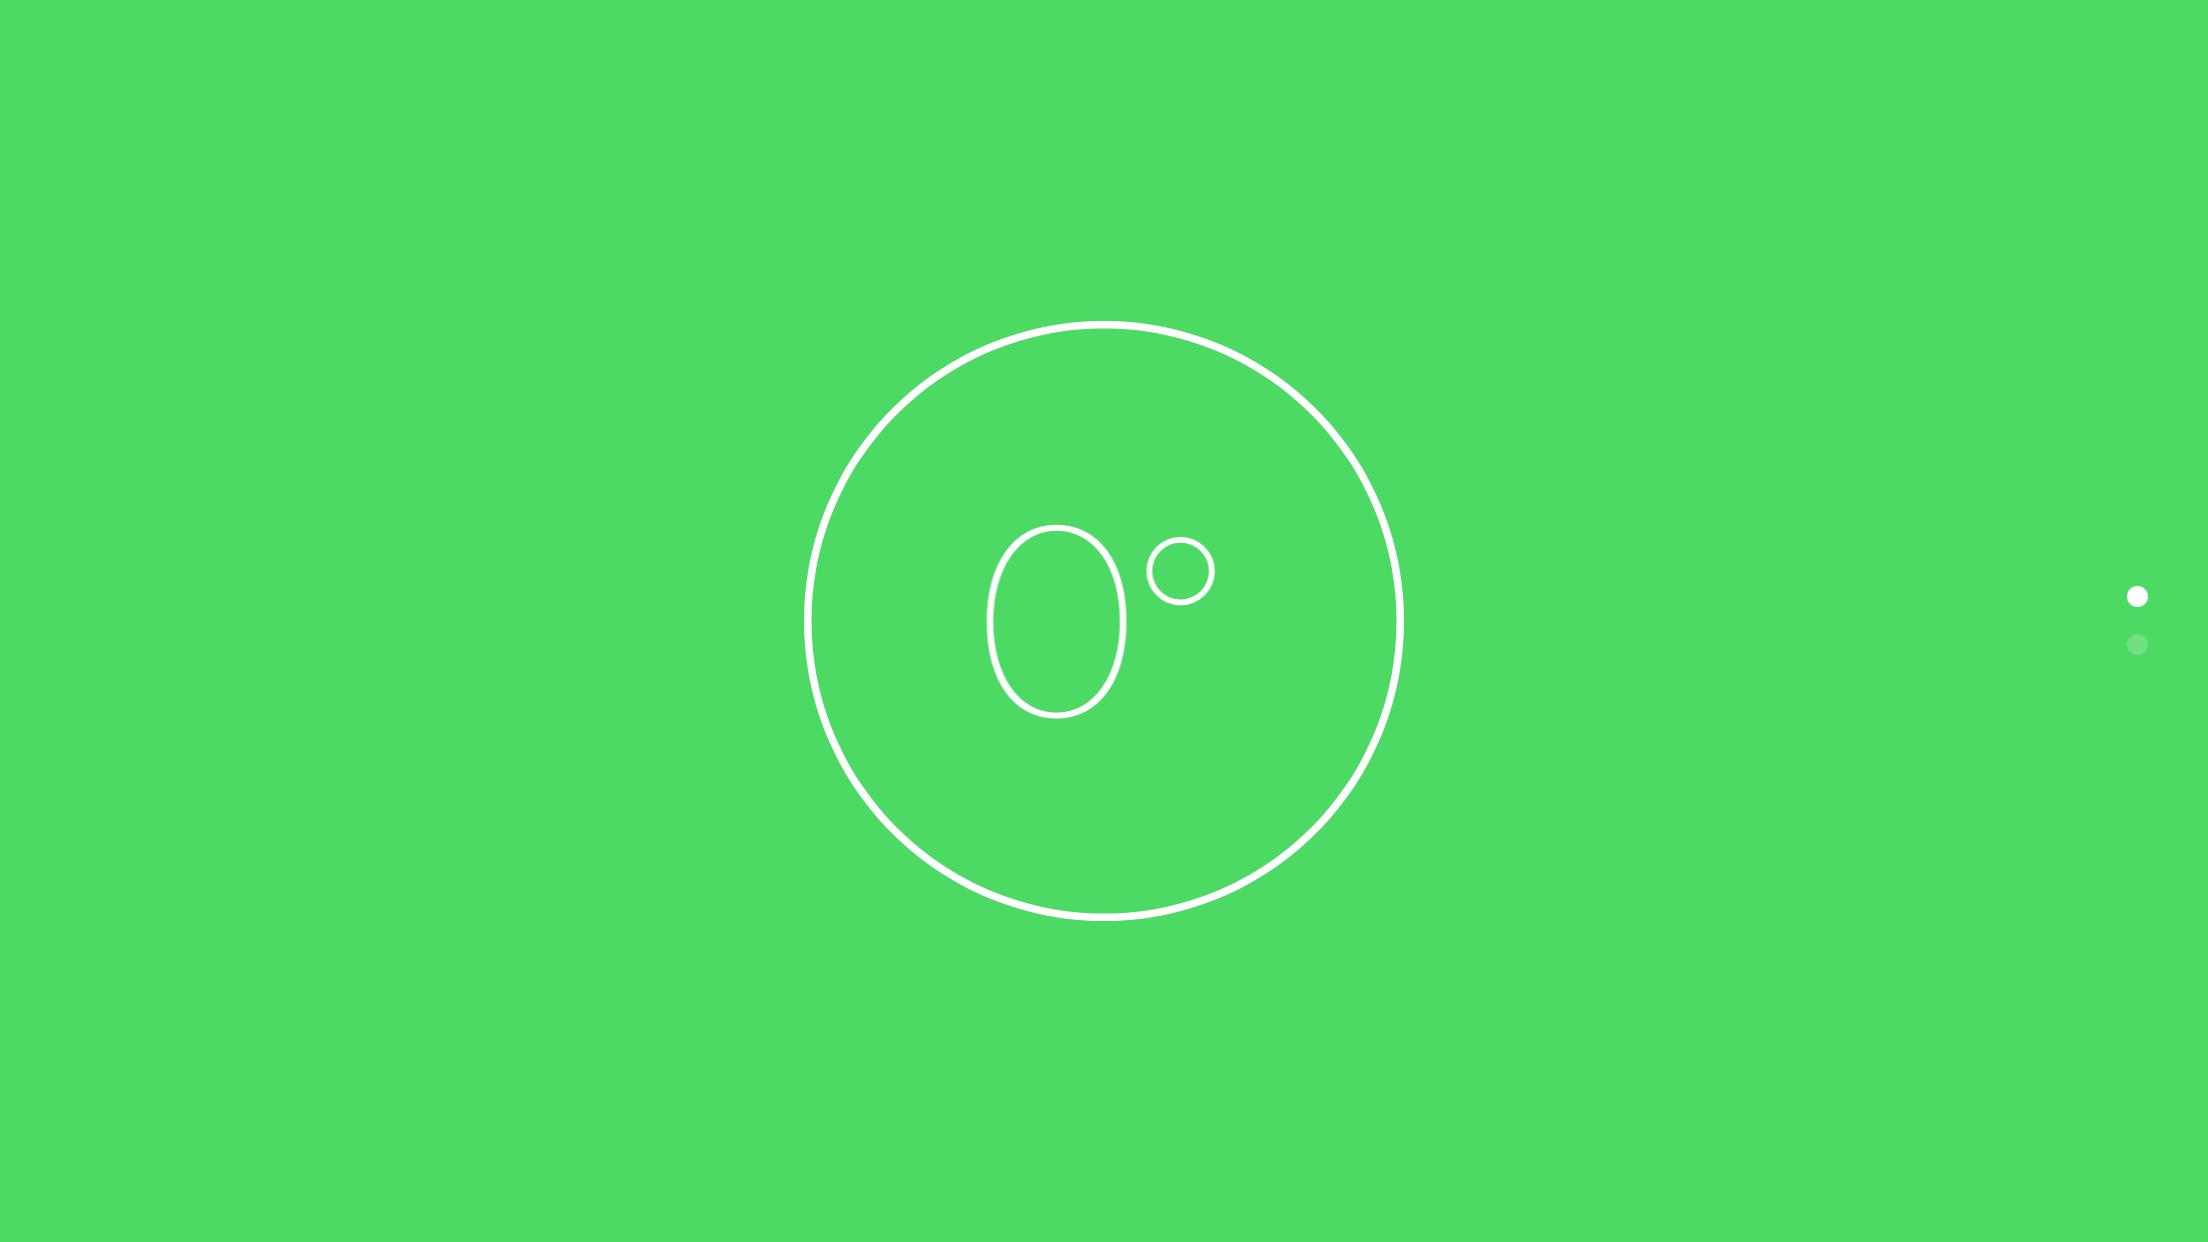 green level spot on